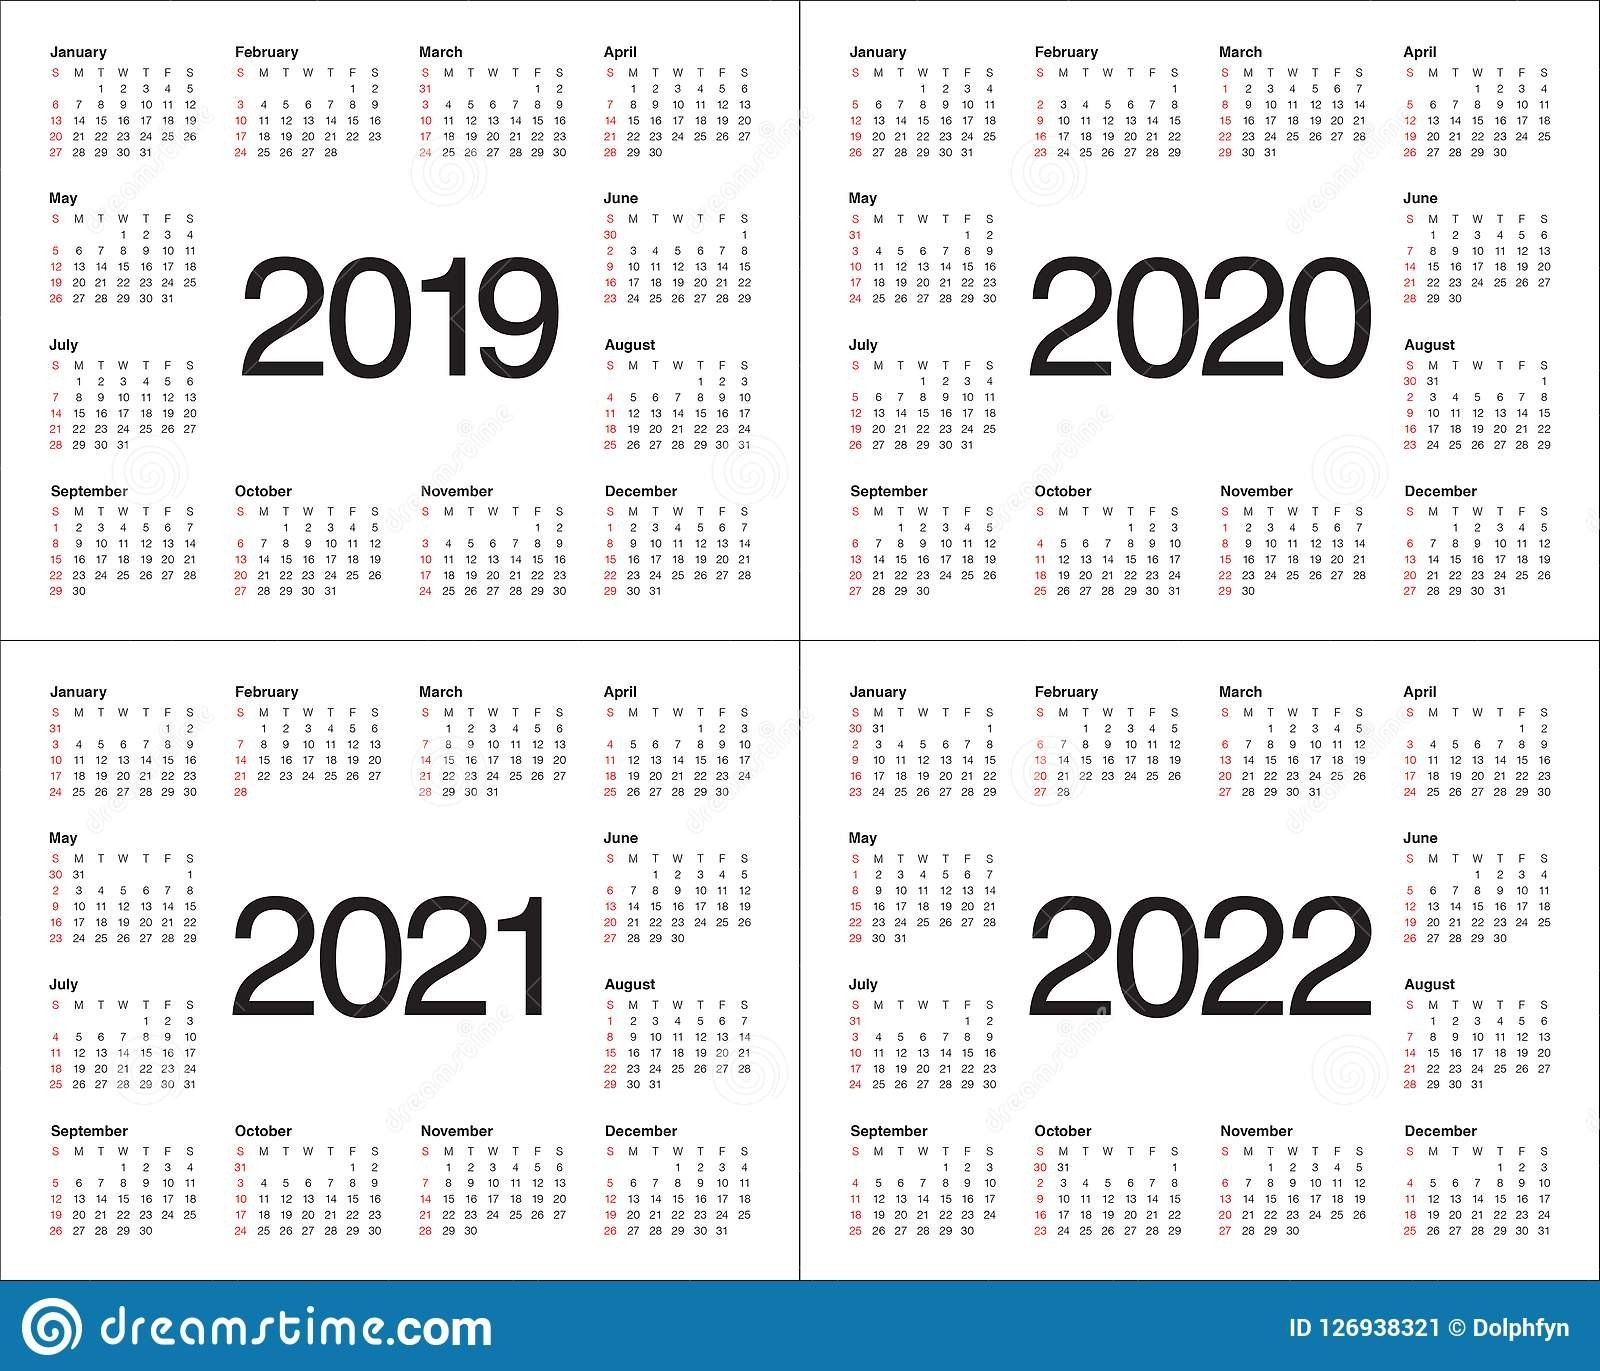 Three Year Printable Calendar 2021 To 2023 | Calendar Printables Free Blank within 3 Year Calendar 2021 2021 2022